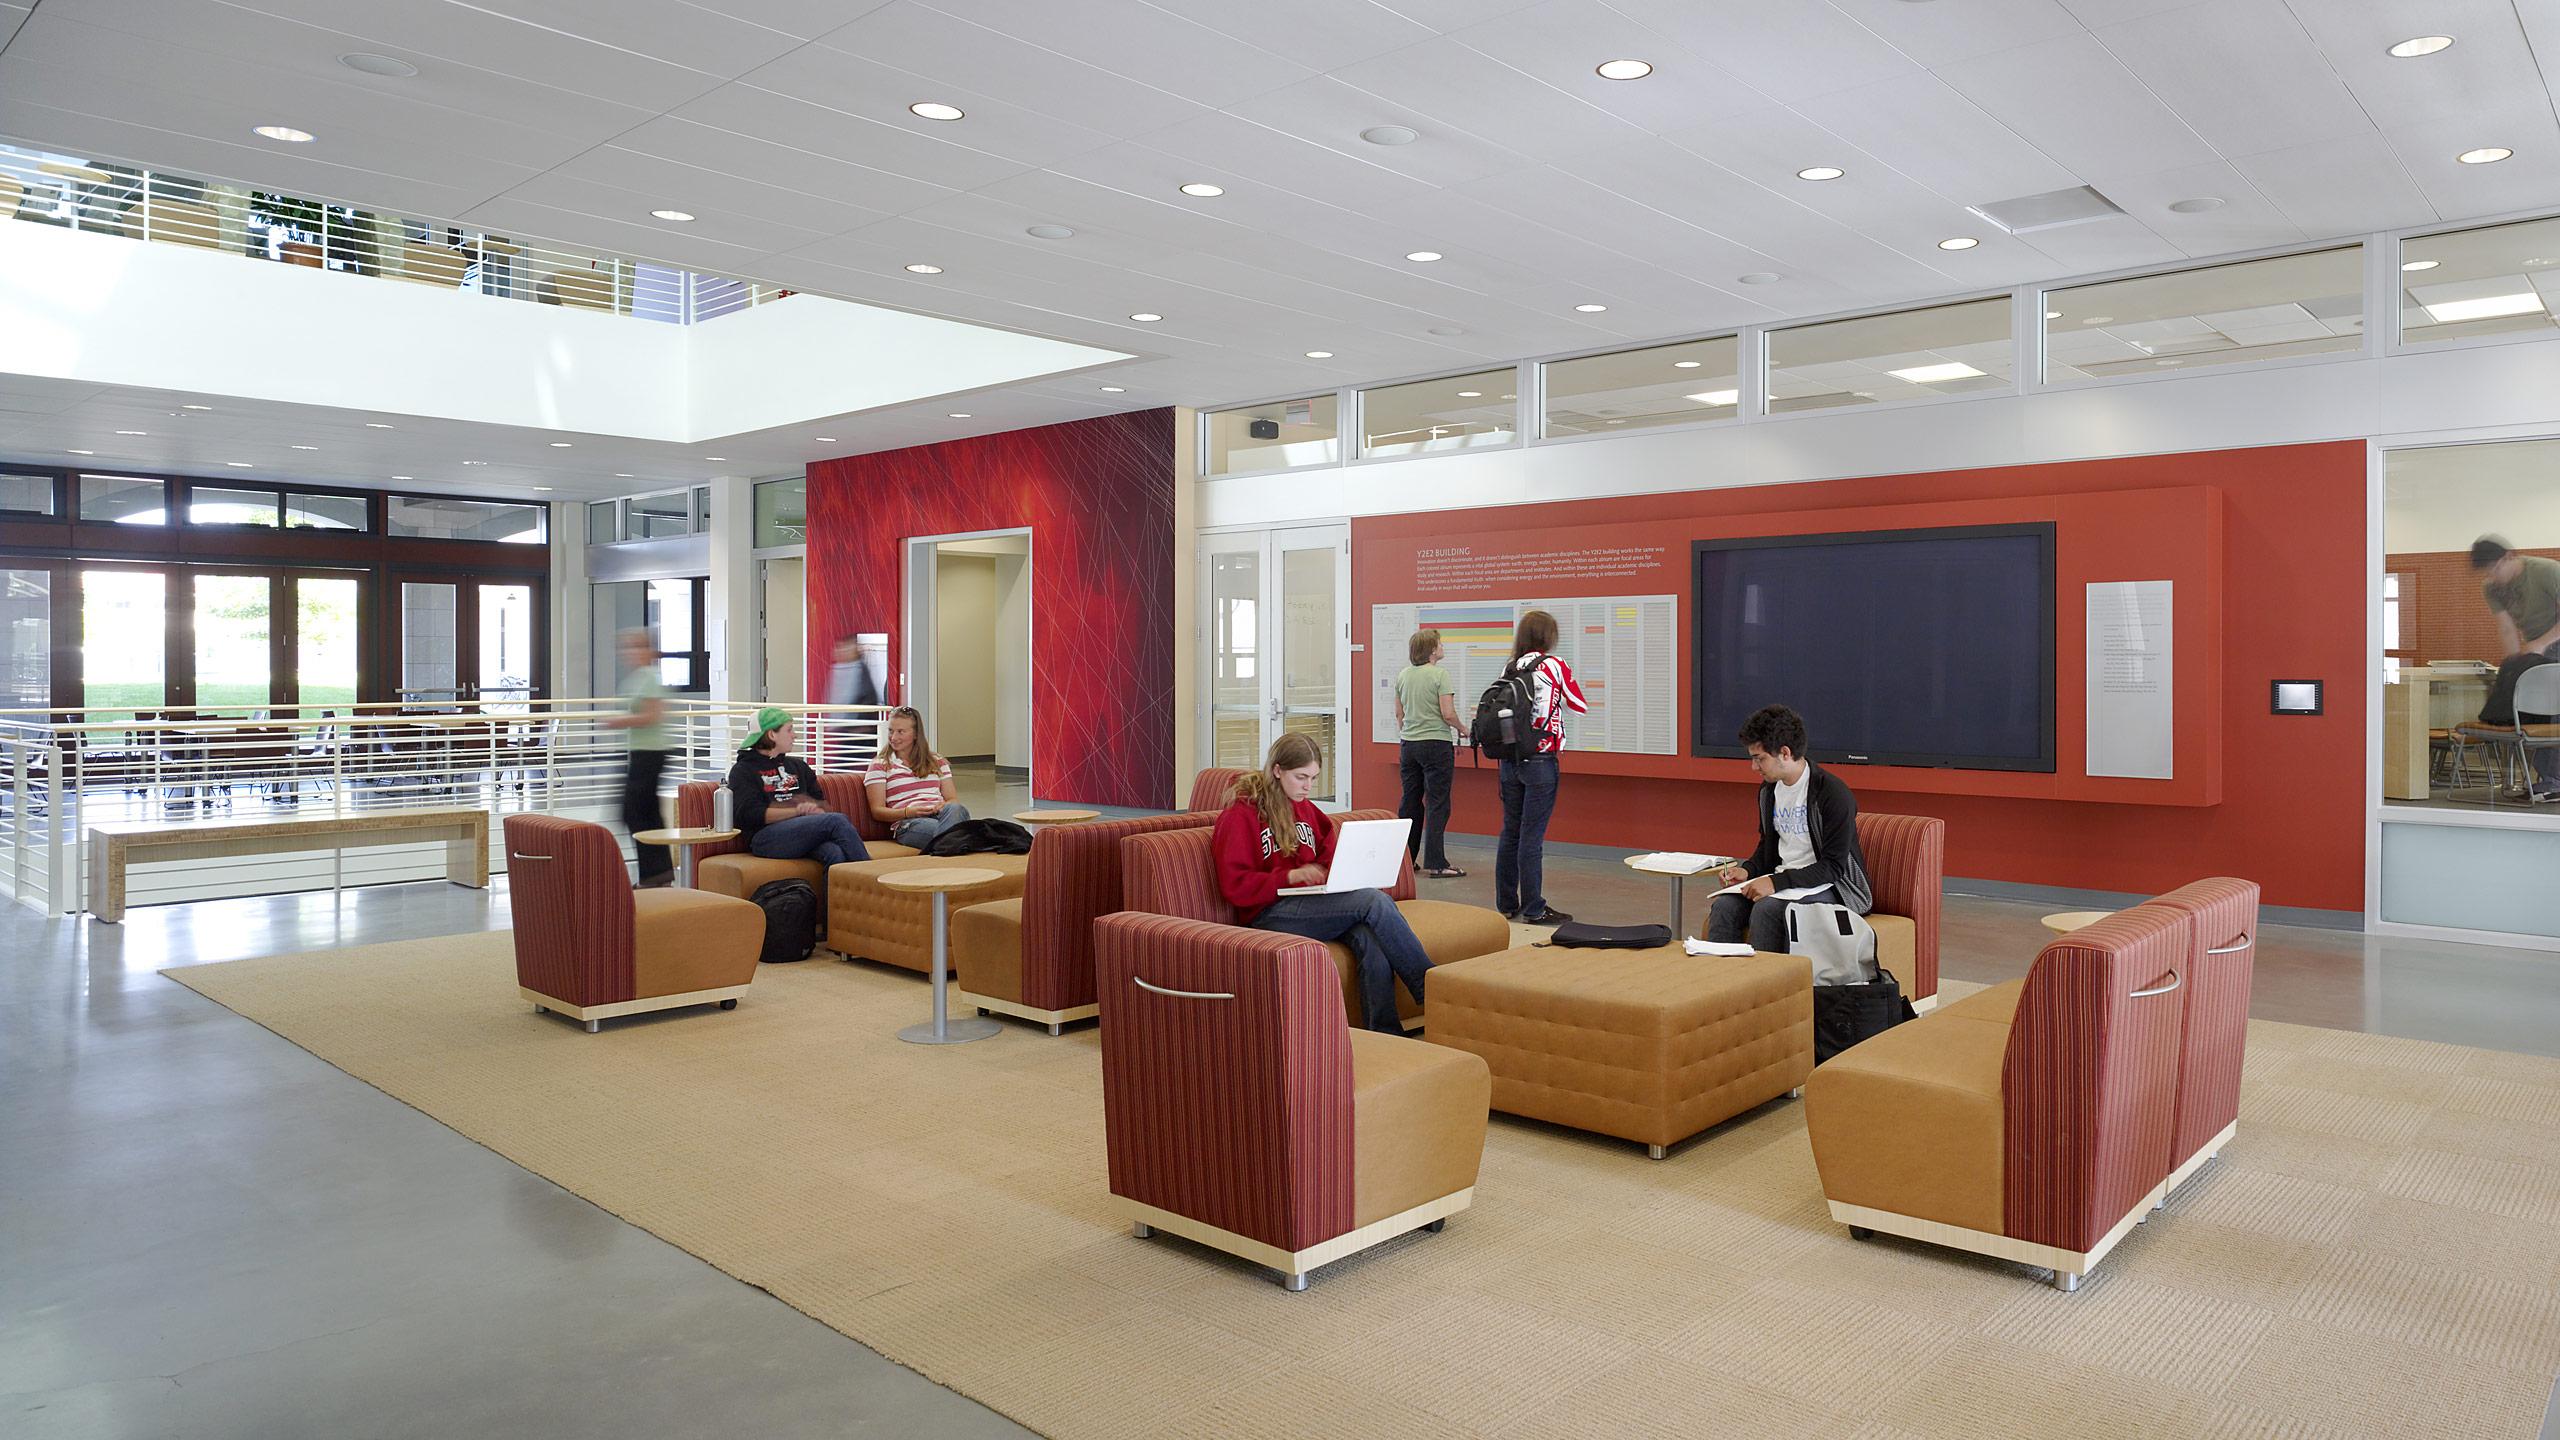 Yang and Yamazaki Environment and Energy Building – Stanford University / image 5